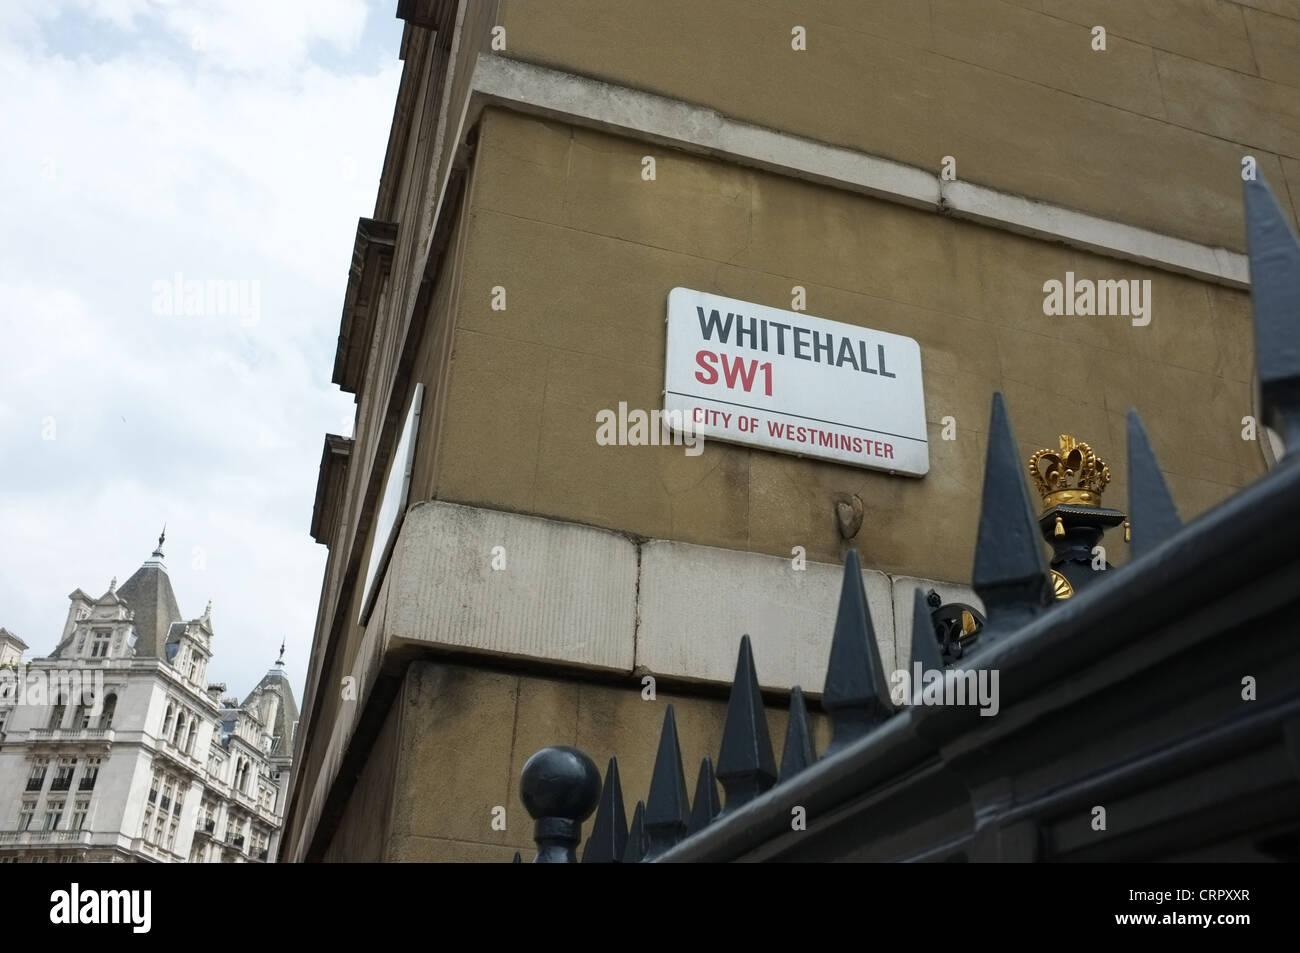 Whitehall street sign, London SW1 - Stock Image